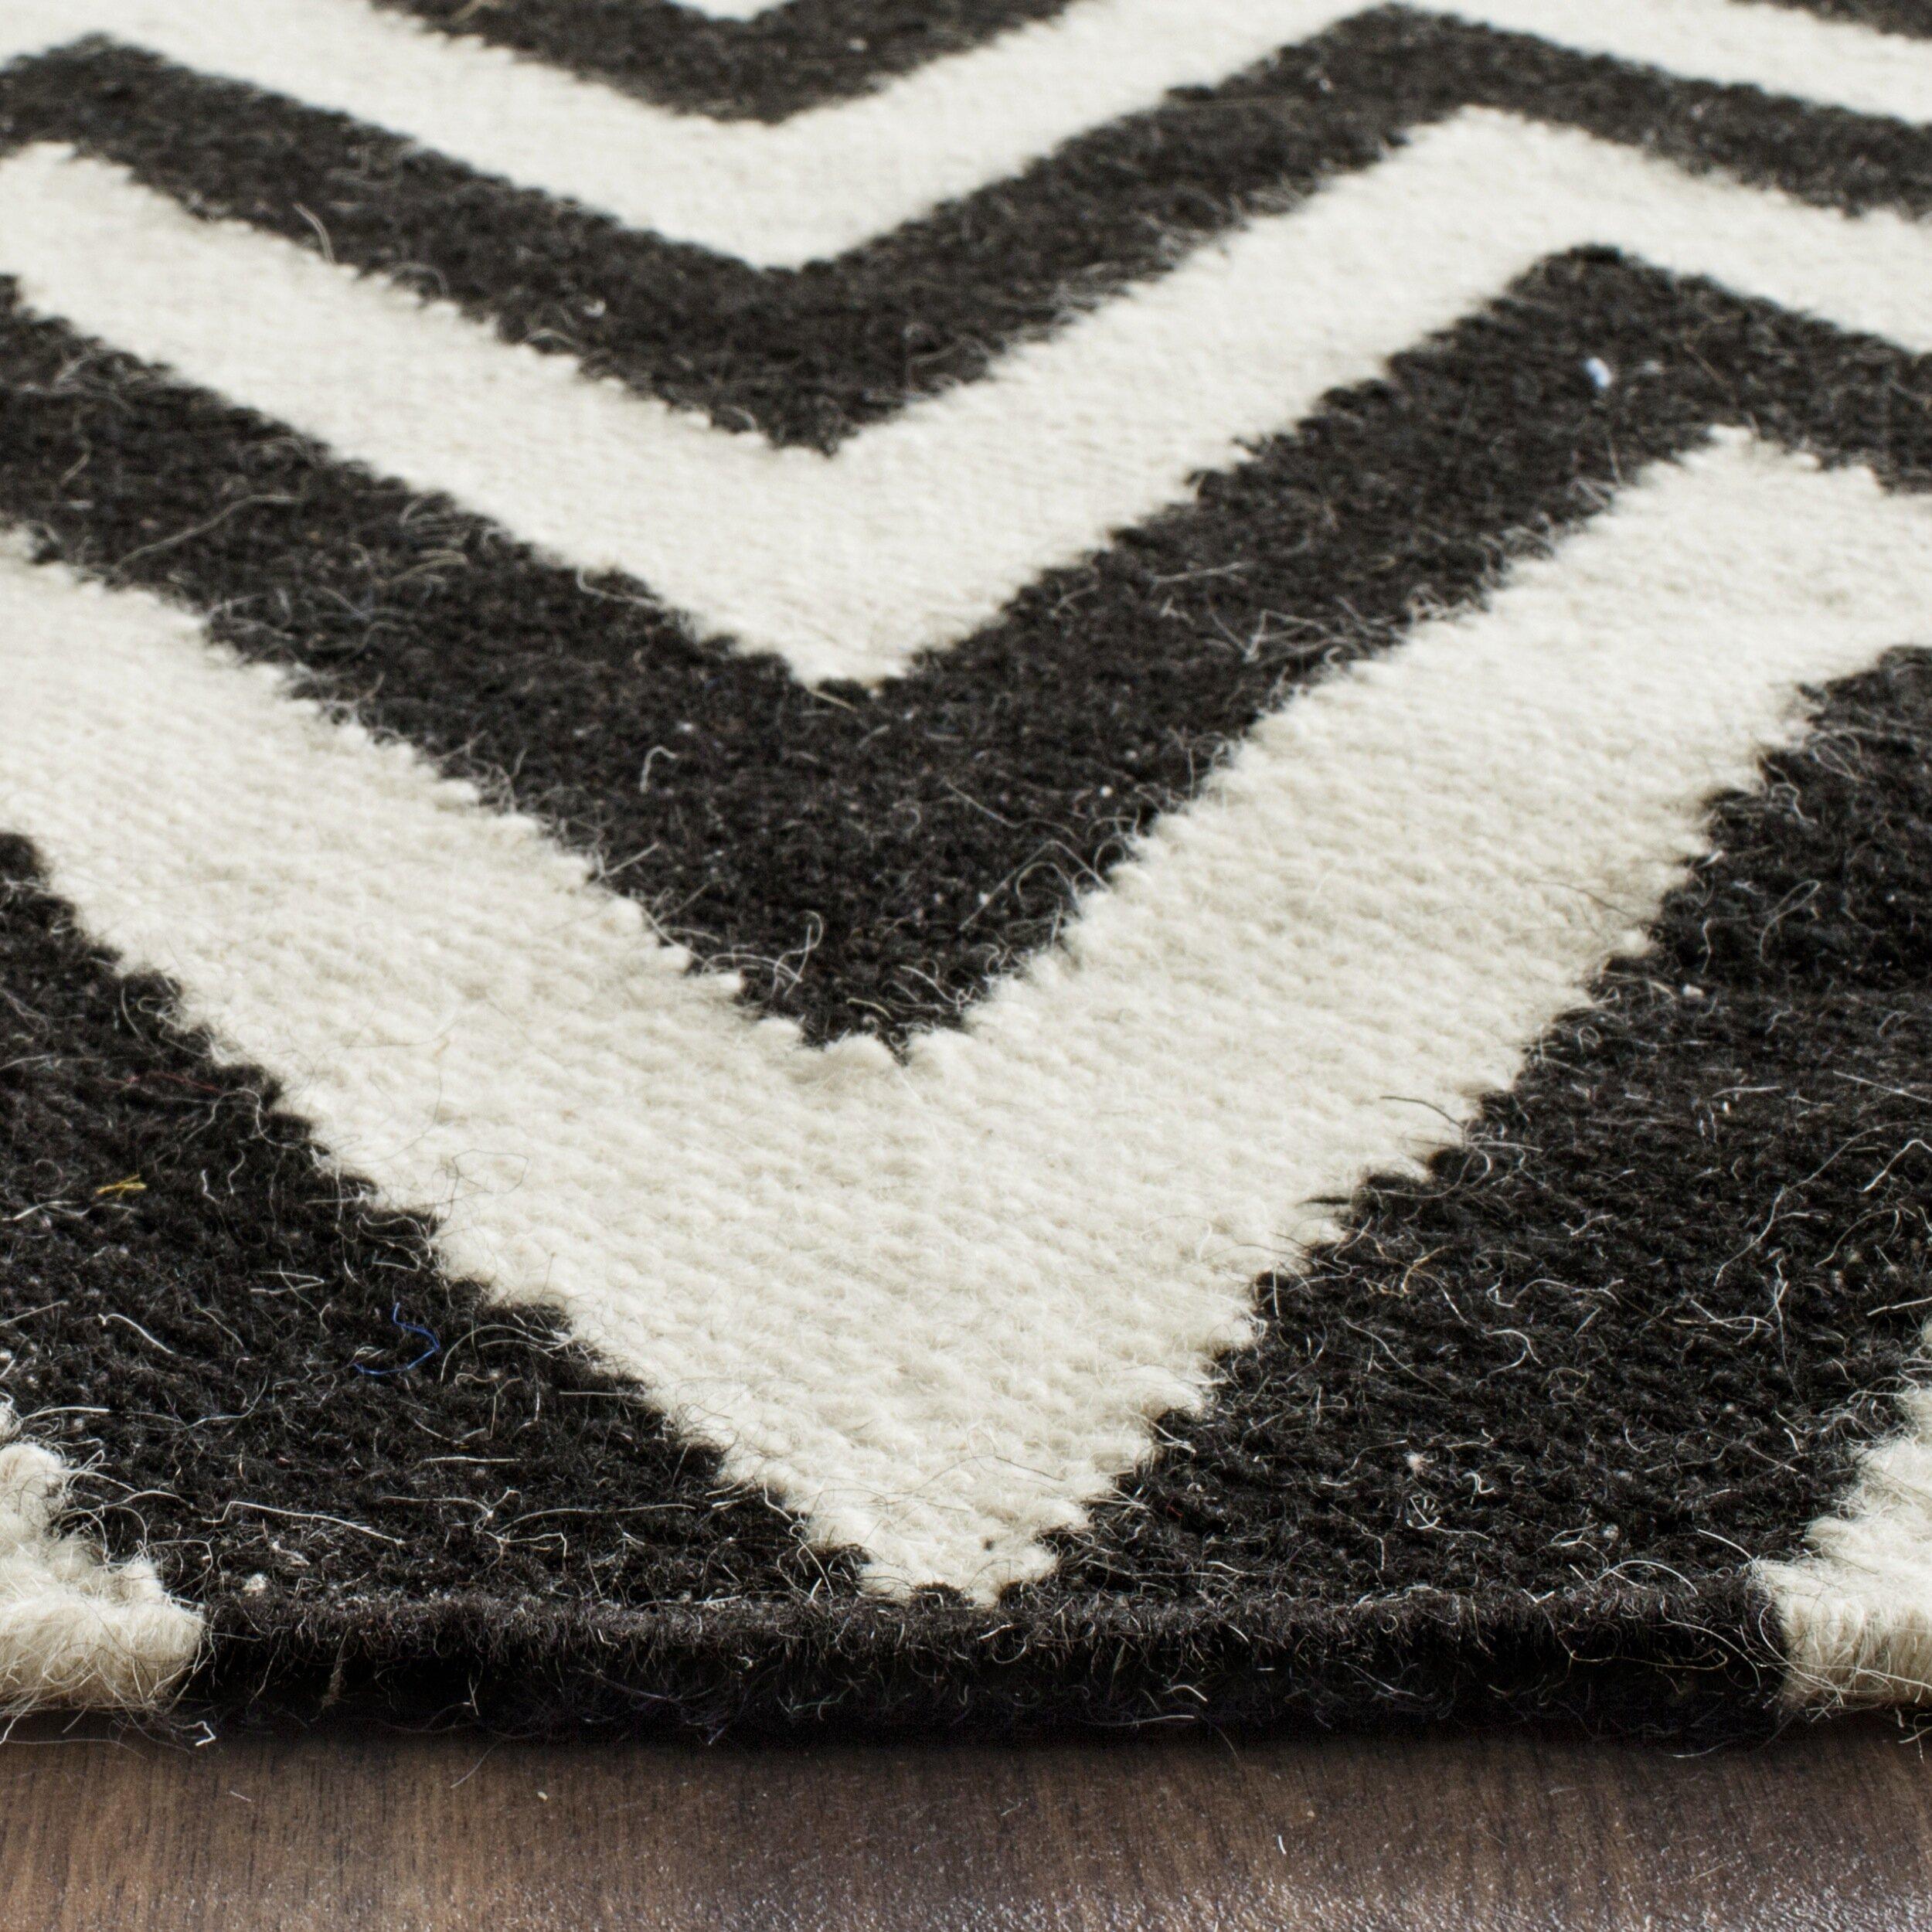 safavieh dhurrie black white area rug reviews wayfair uk. Black Bedroom Furniture Sets. Home Design Ideas